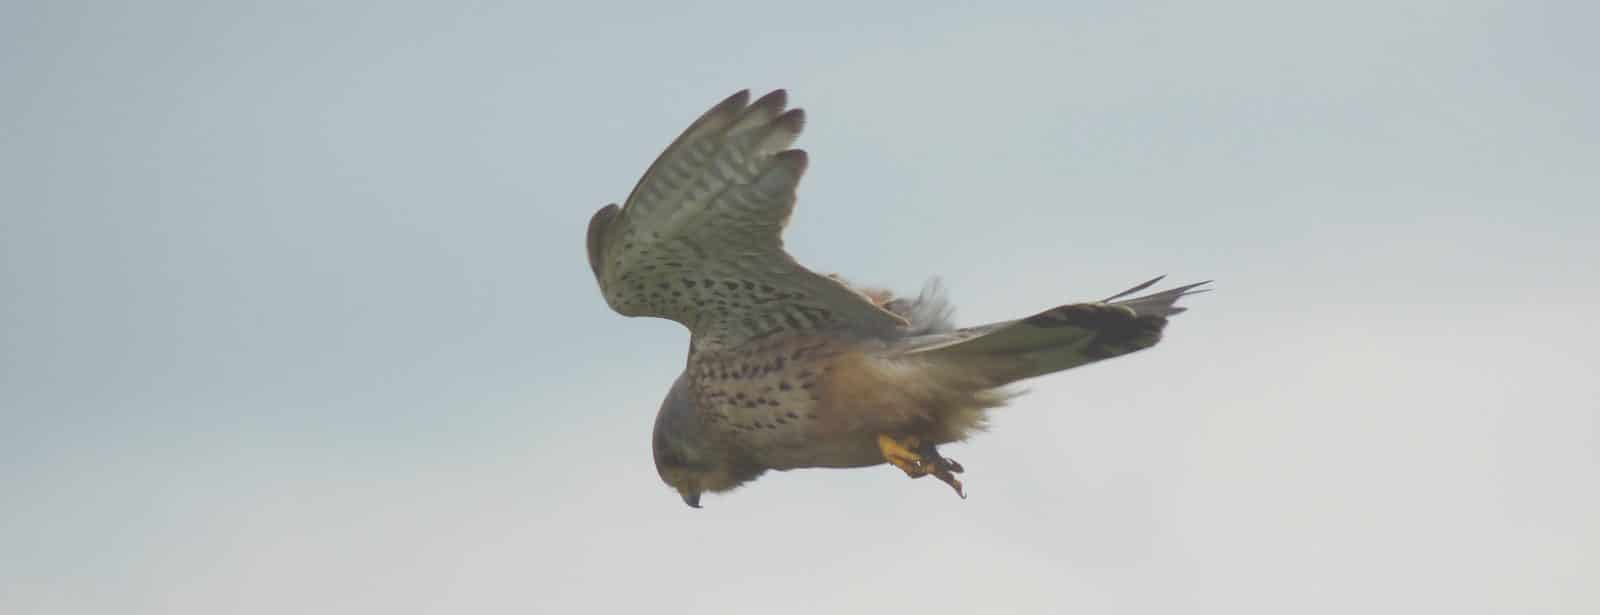 bird survey south wales